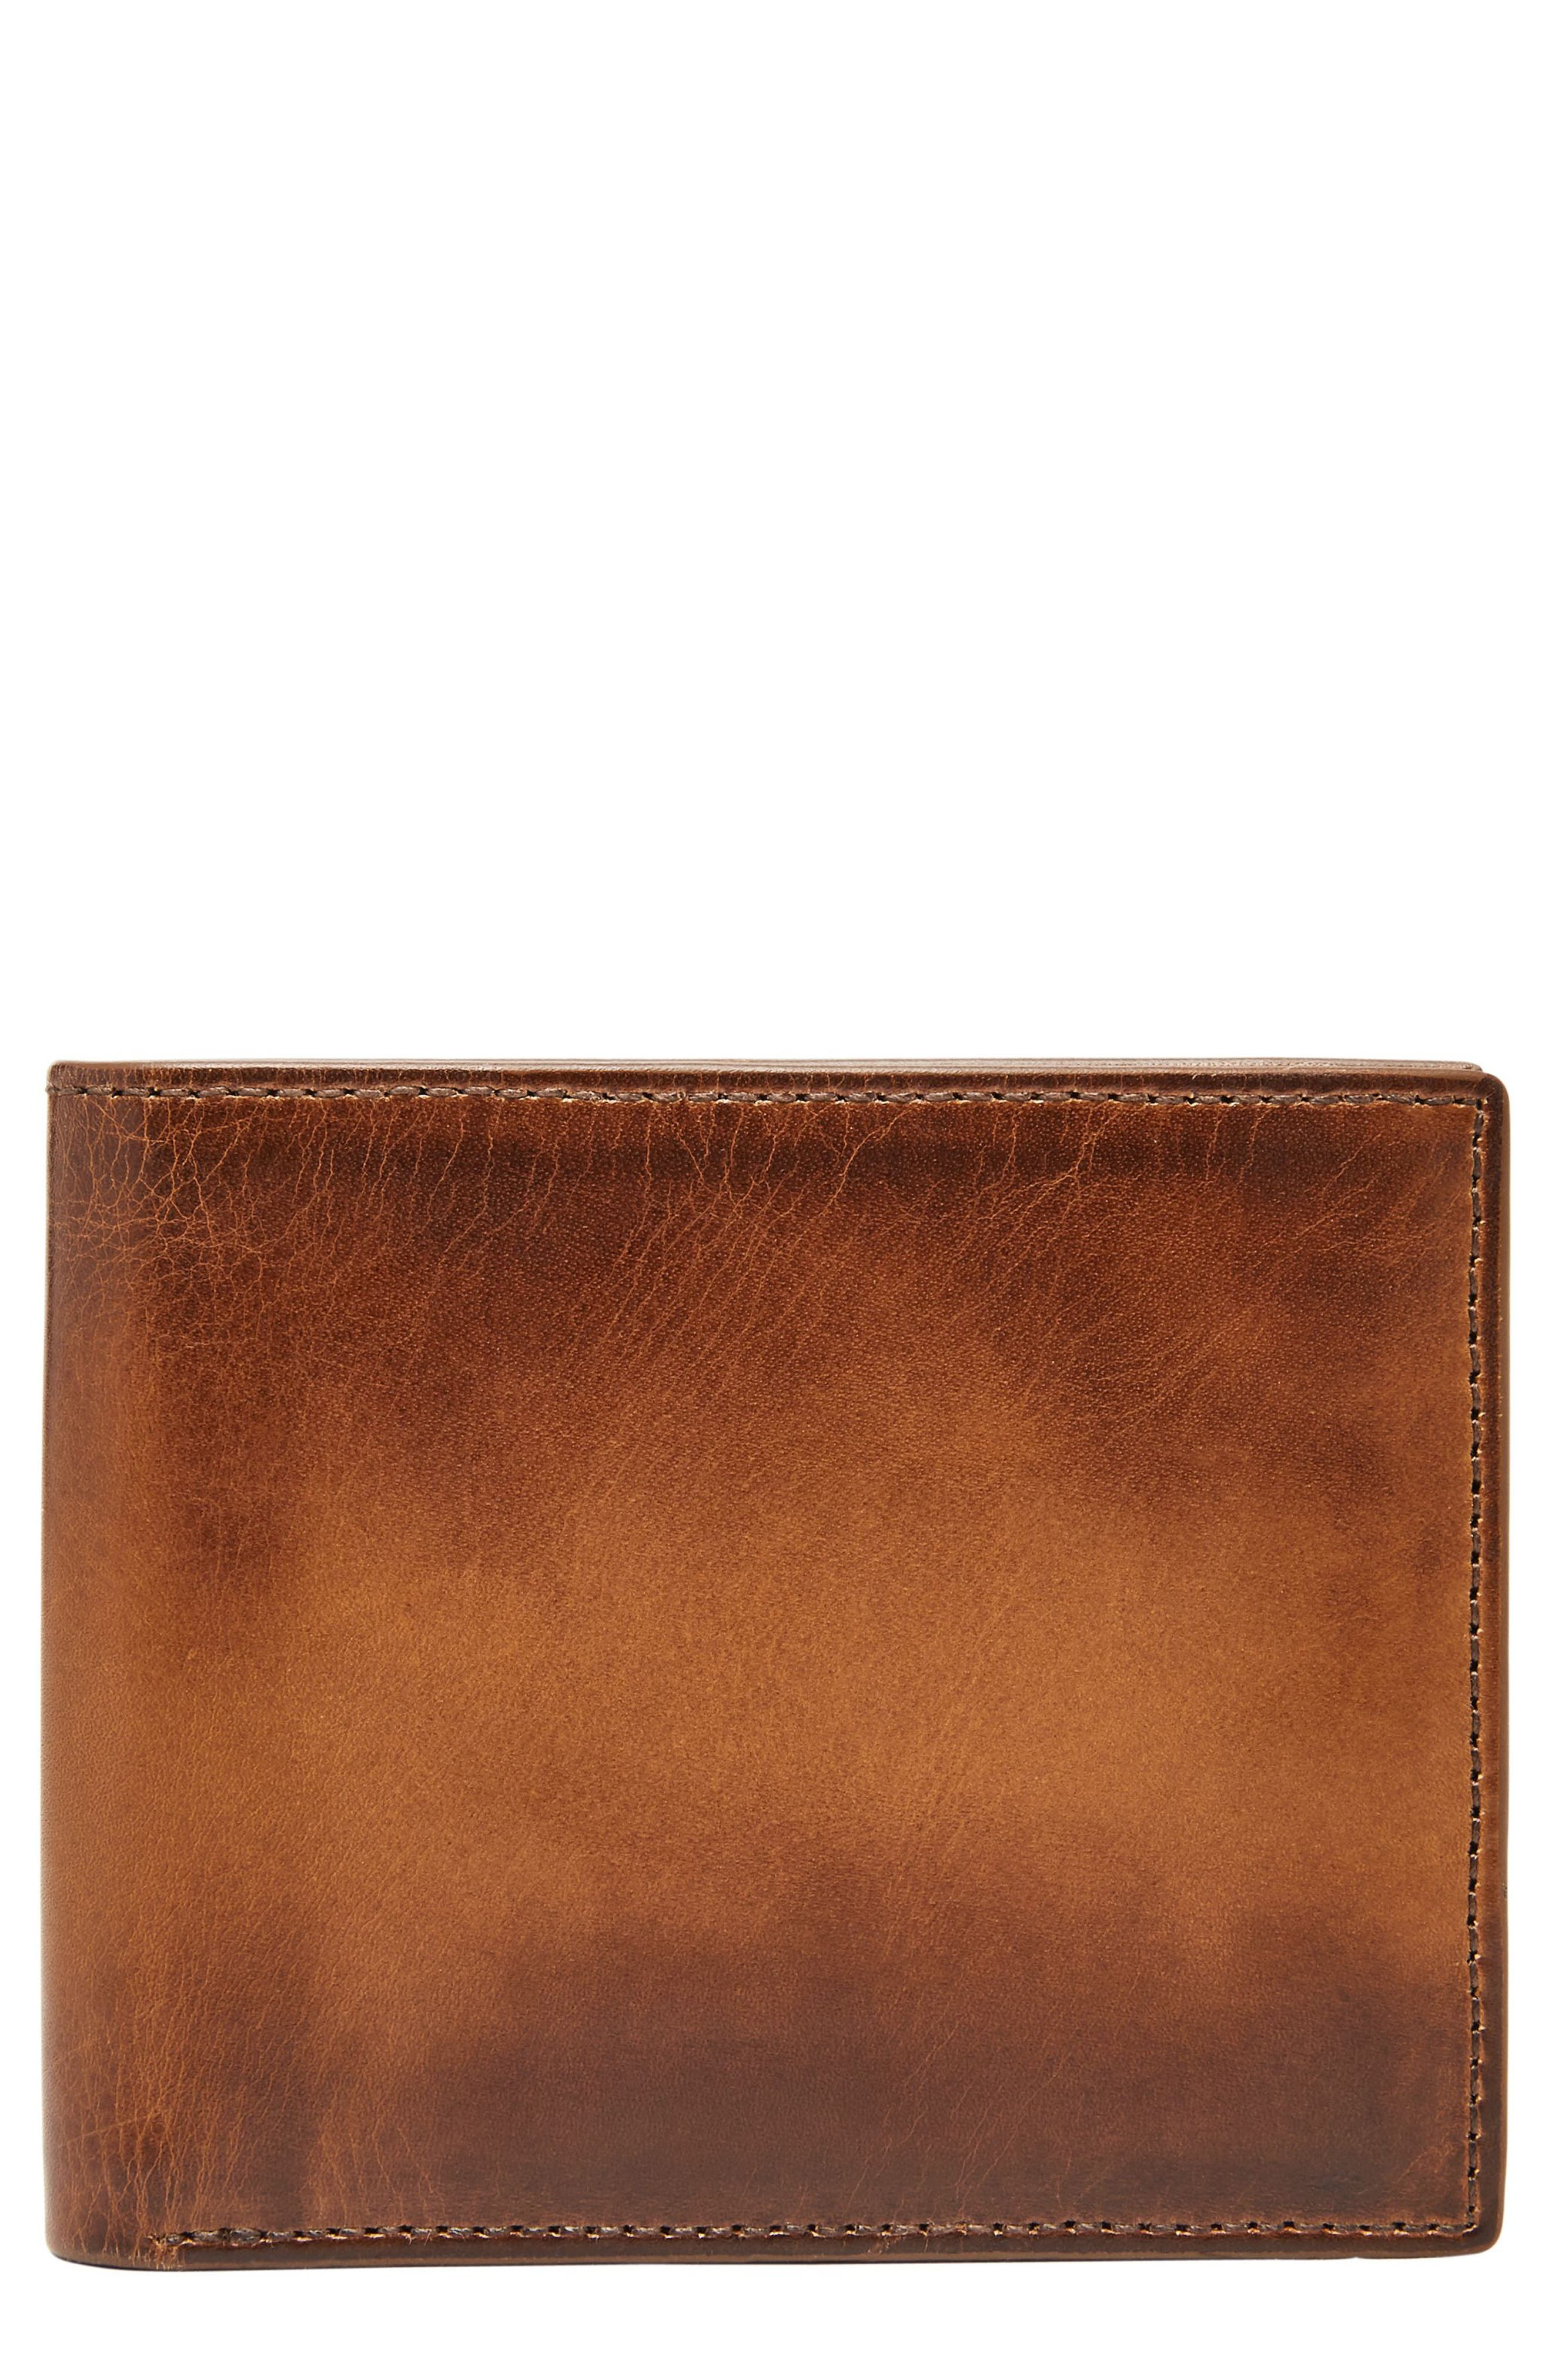 Paul Leather Wallet,                             Main thumbnail 1, color,                             222